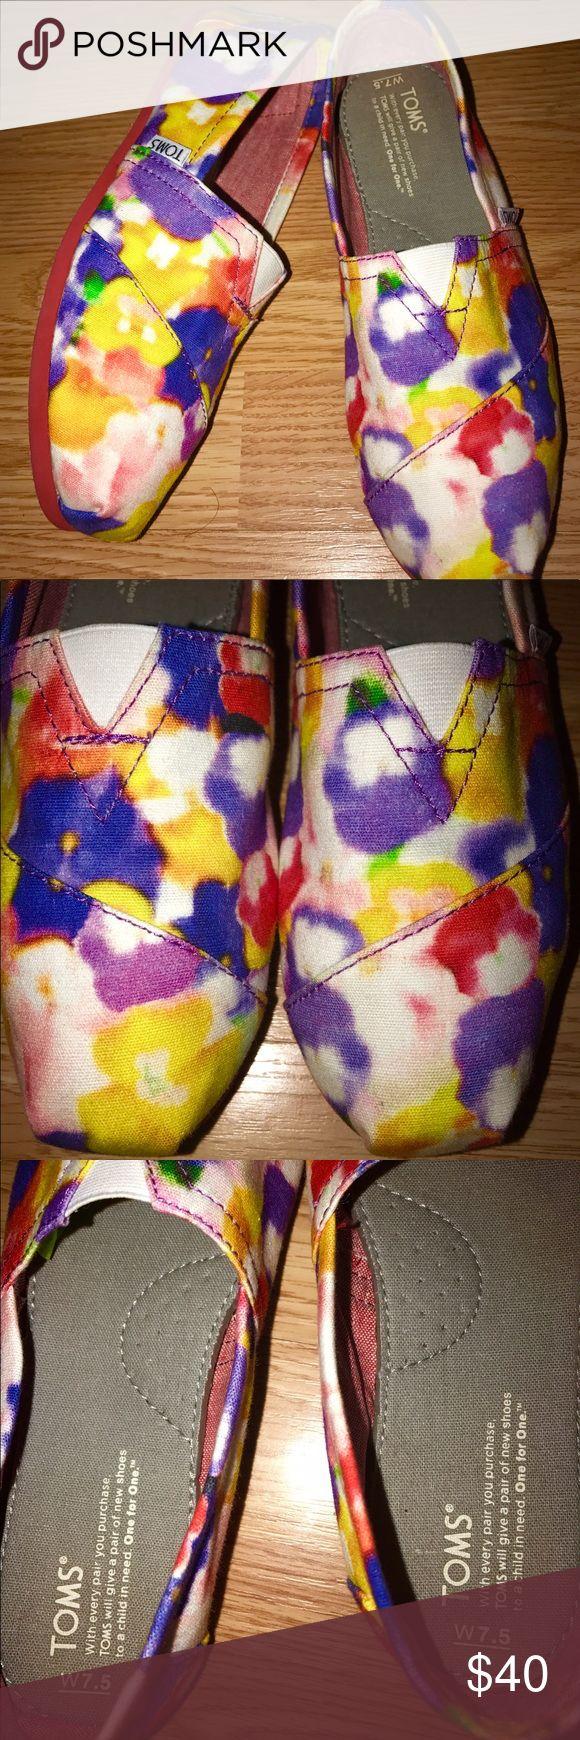 PRETTY FLORAL TOMS Excellent condition, water color floral unique toms. No visible wear. TOMS Shoes Flats & Loafers